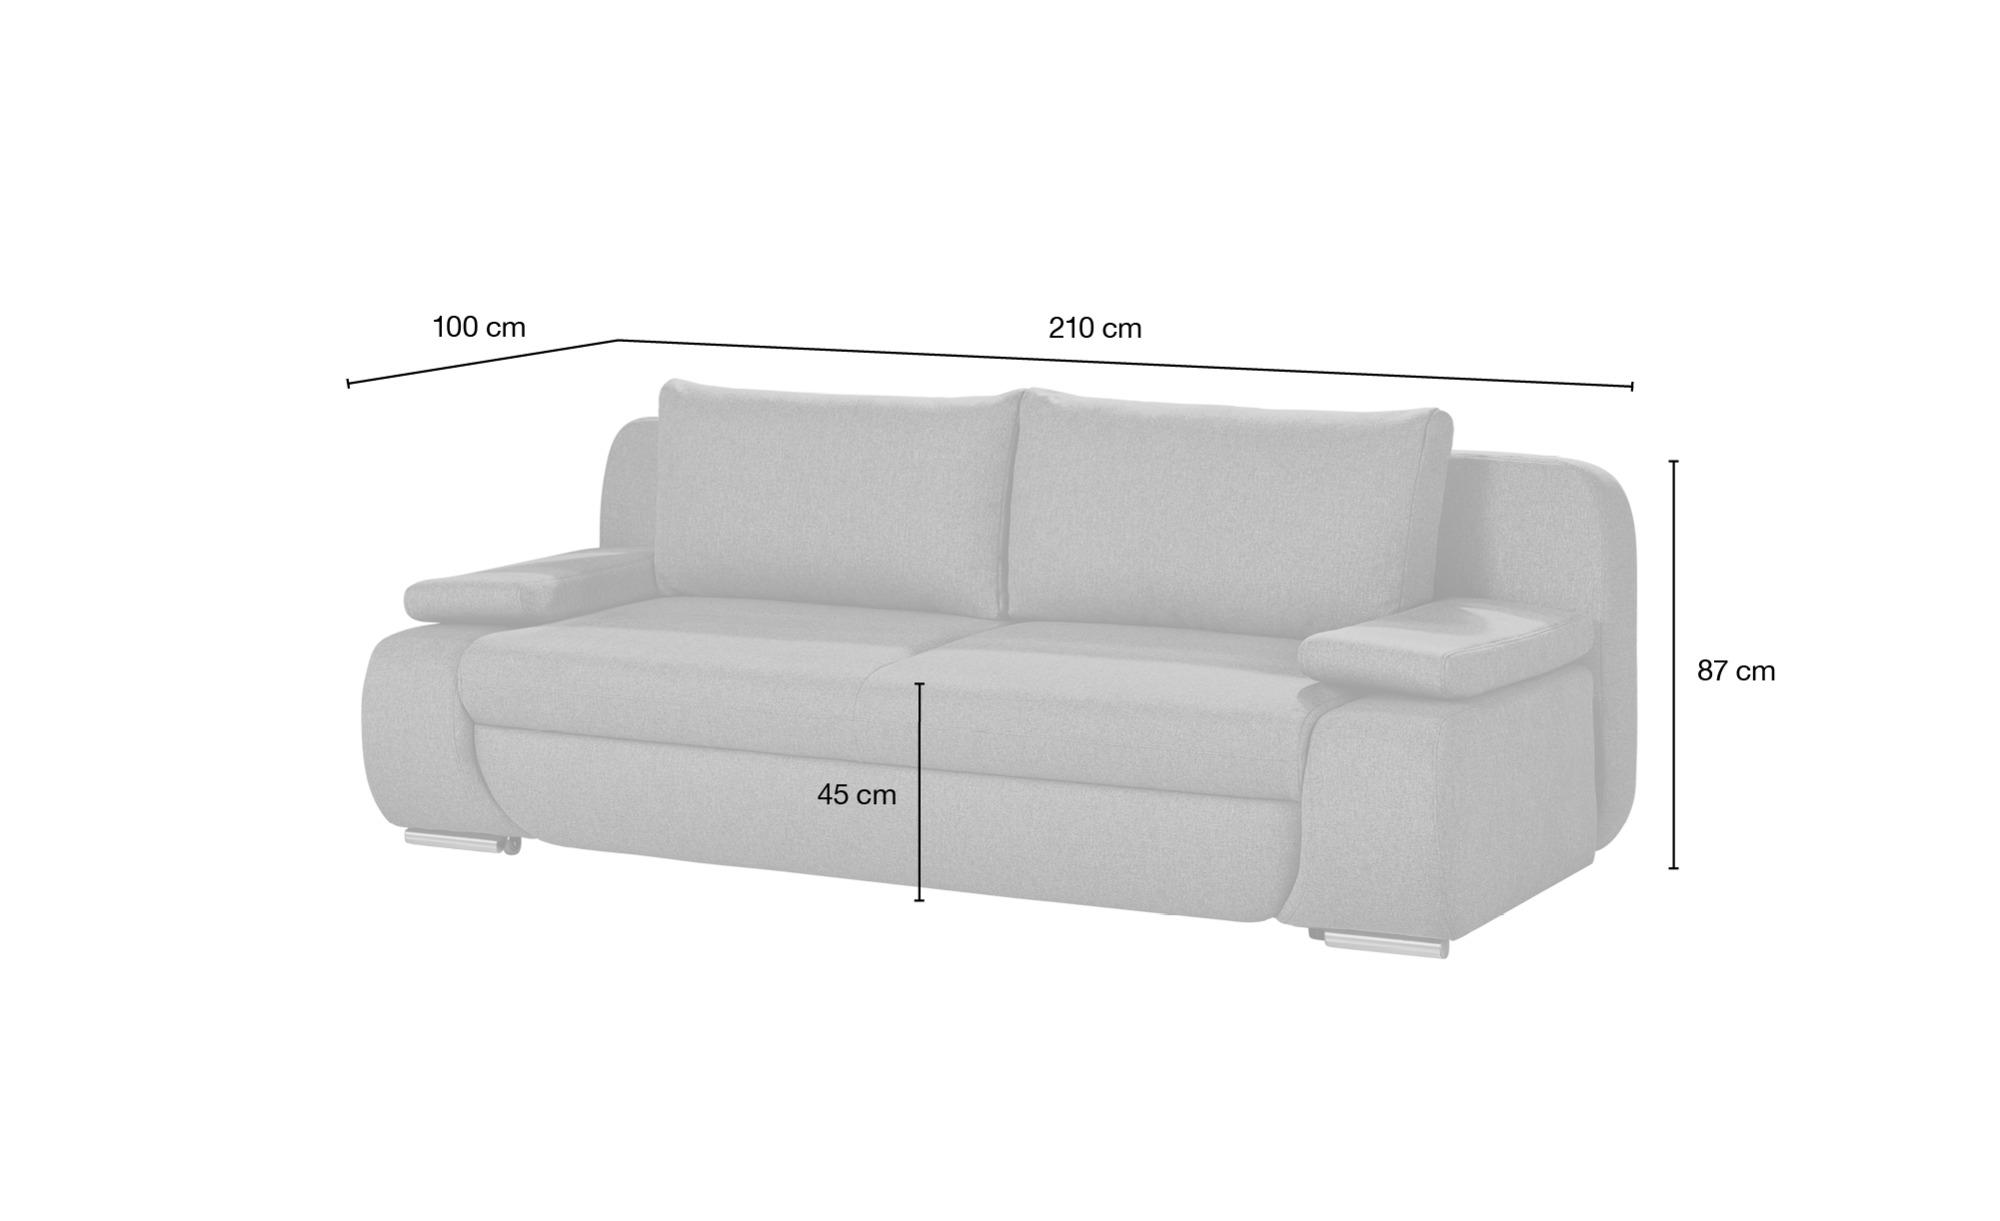 smart Schlafsofa grau - Webstoff Bonita ¦ grau ¦ Maße (cm): B: 210 H: 87 T: 100 Polstermöbel > Sofas > 2-Sitzer - Höffner